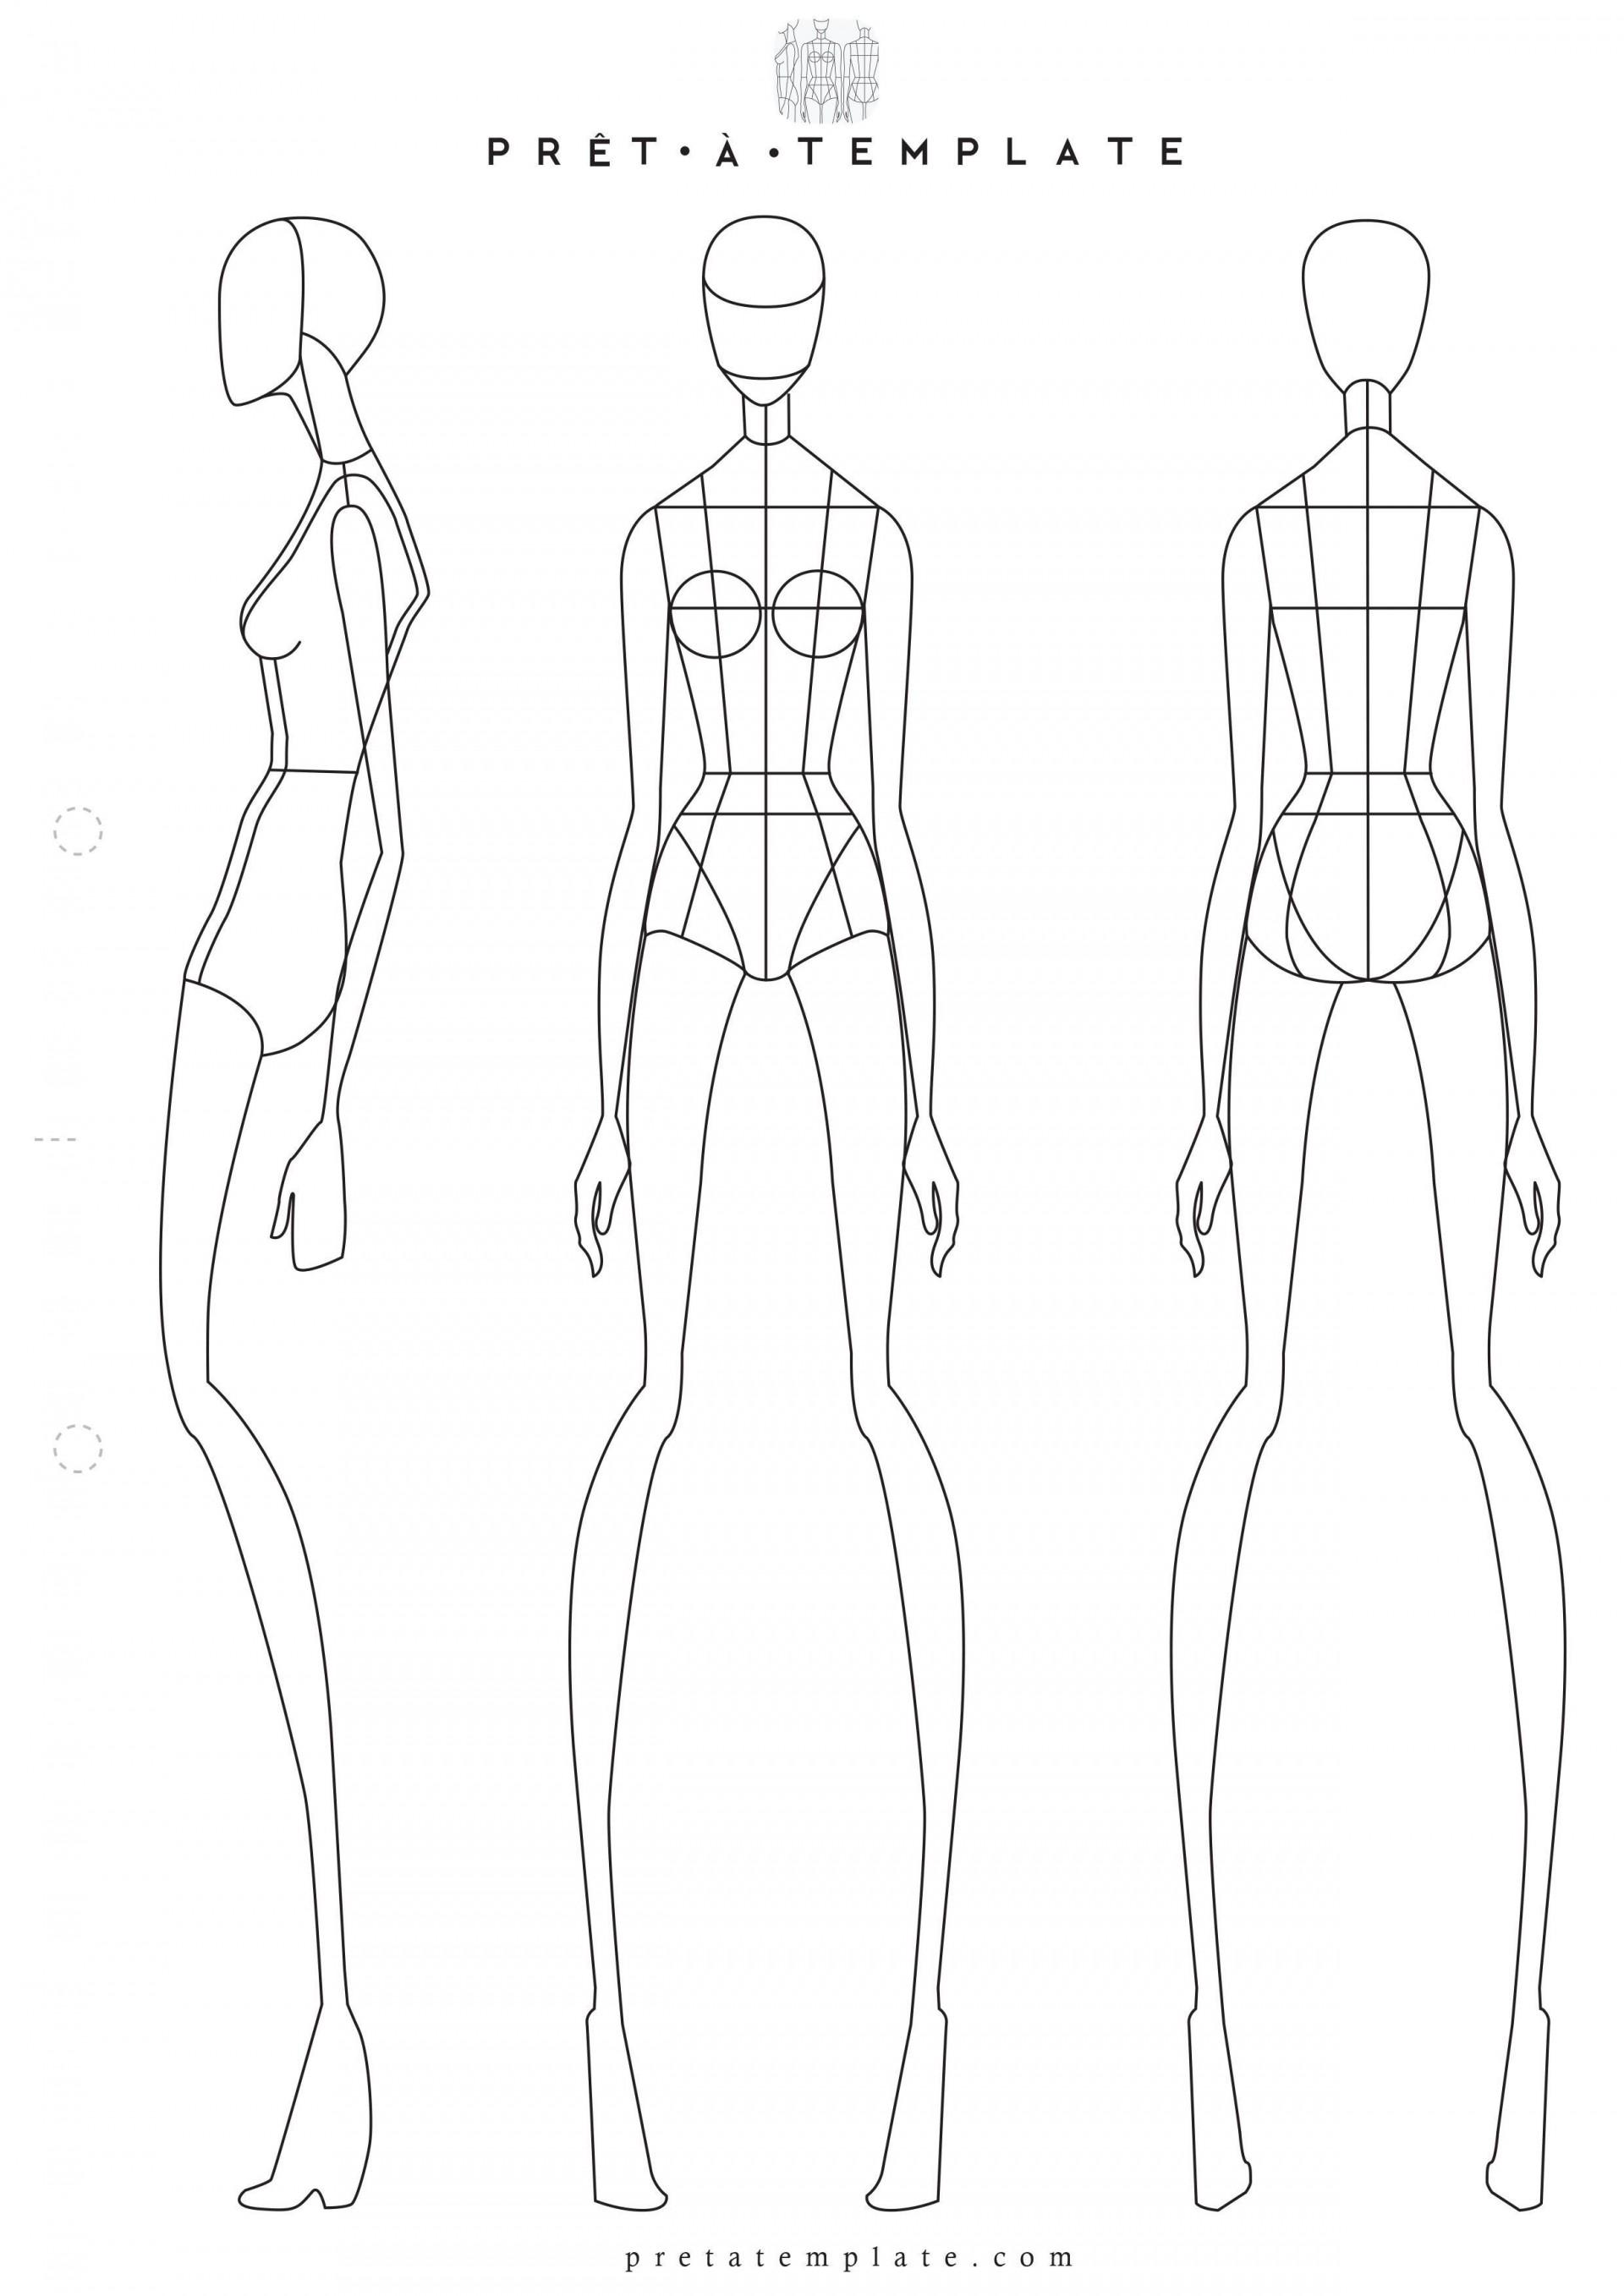 006 Phenomenal Body Template For Fashion Design High Def  Female Male Human1920